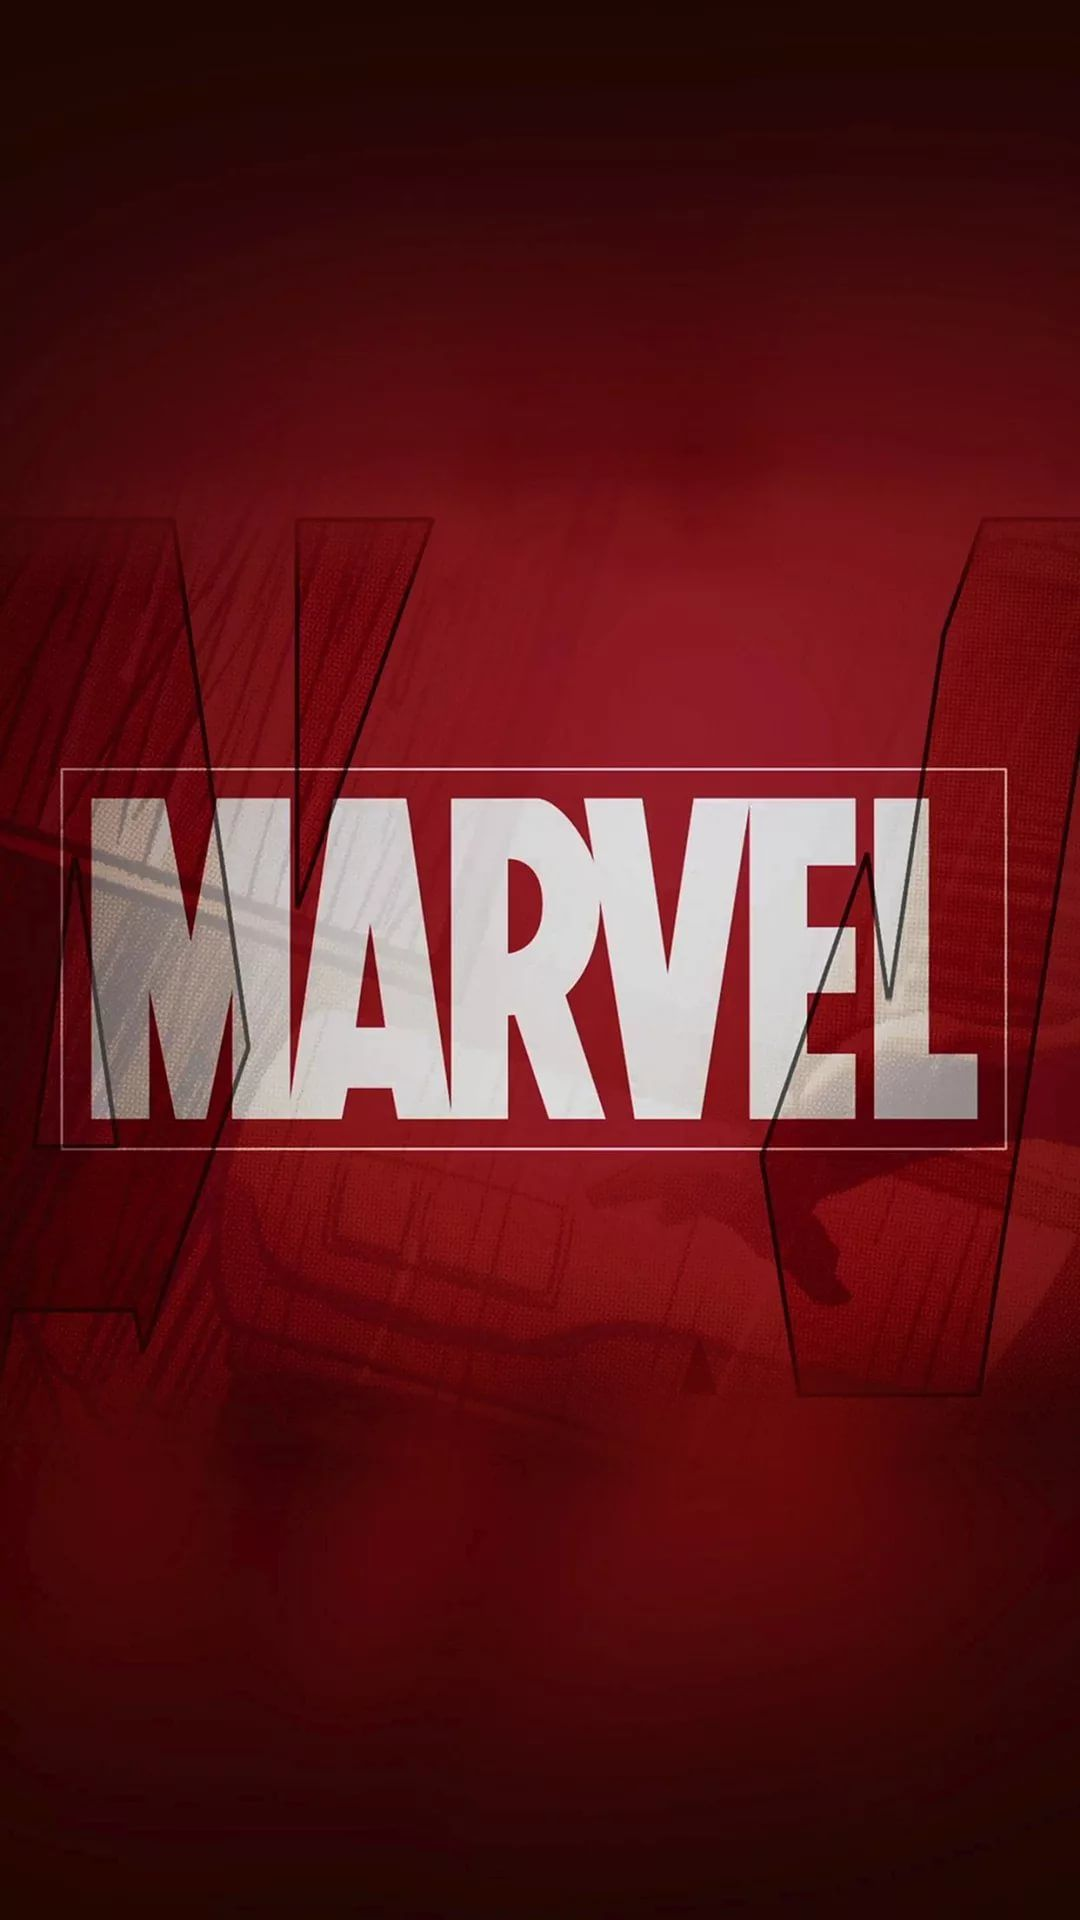 Marvel iPhone wallpaper